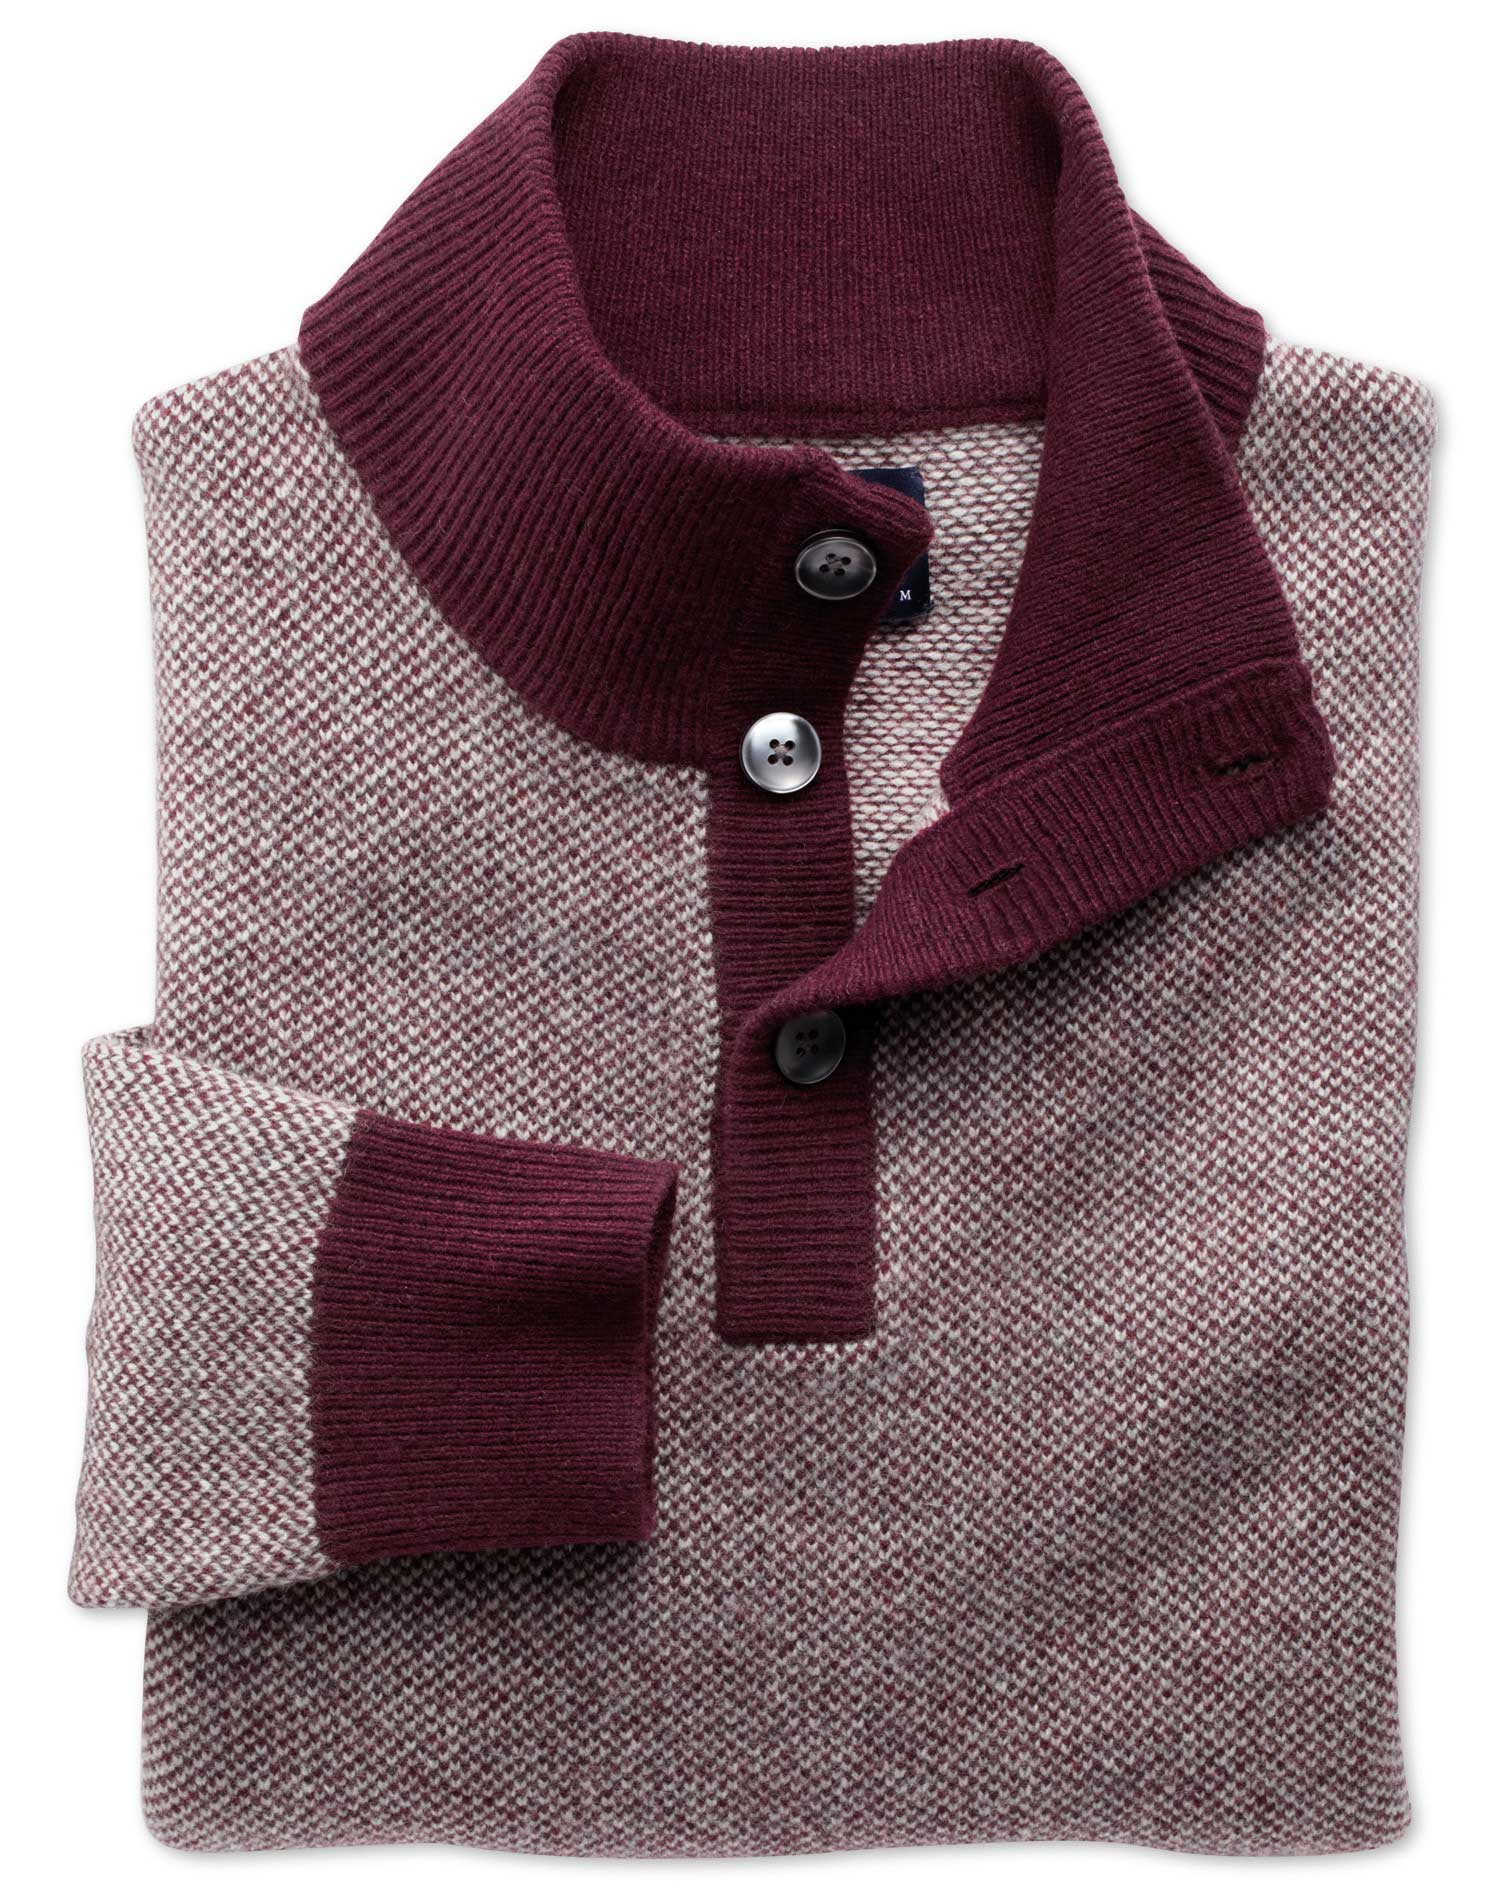 Wine Jacquard Button Neck Wool Jumper Size XXXL by Charles Tyrwhitt